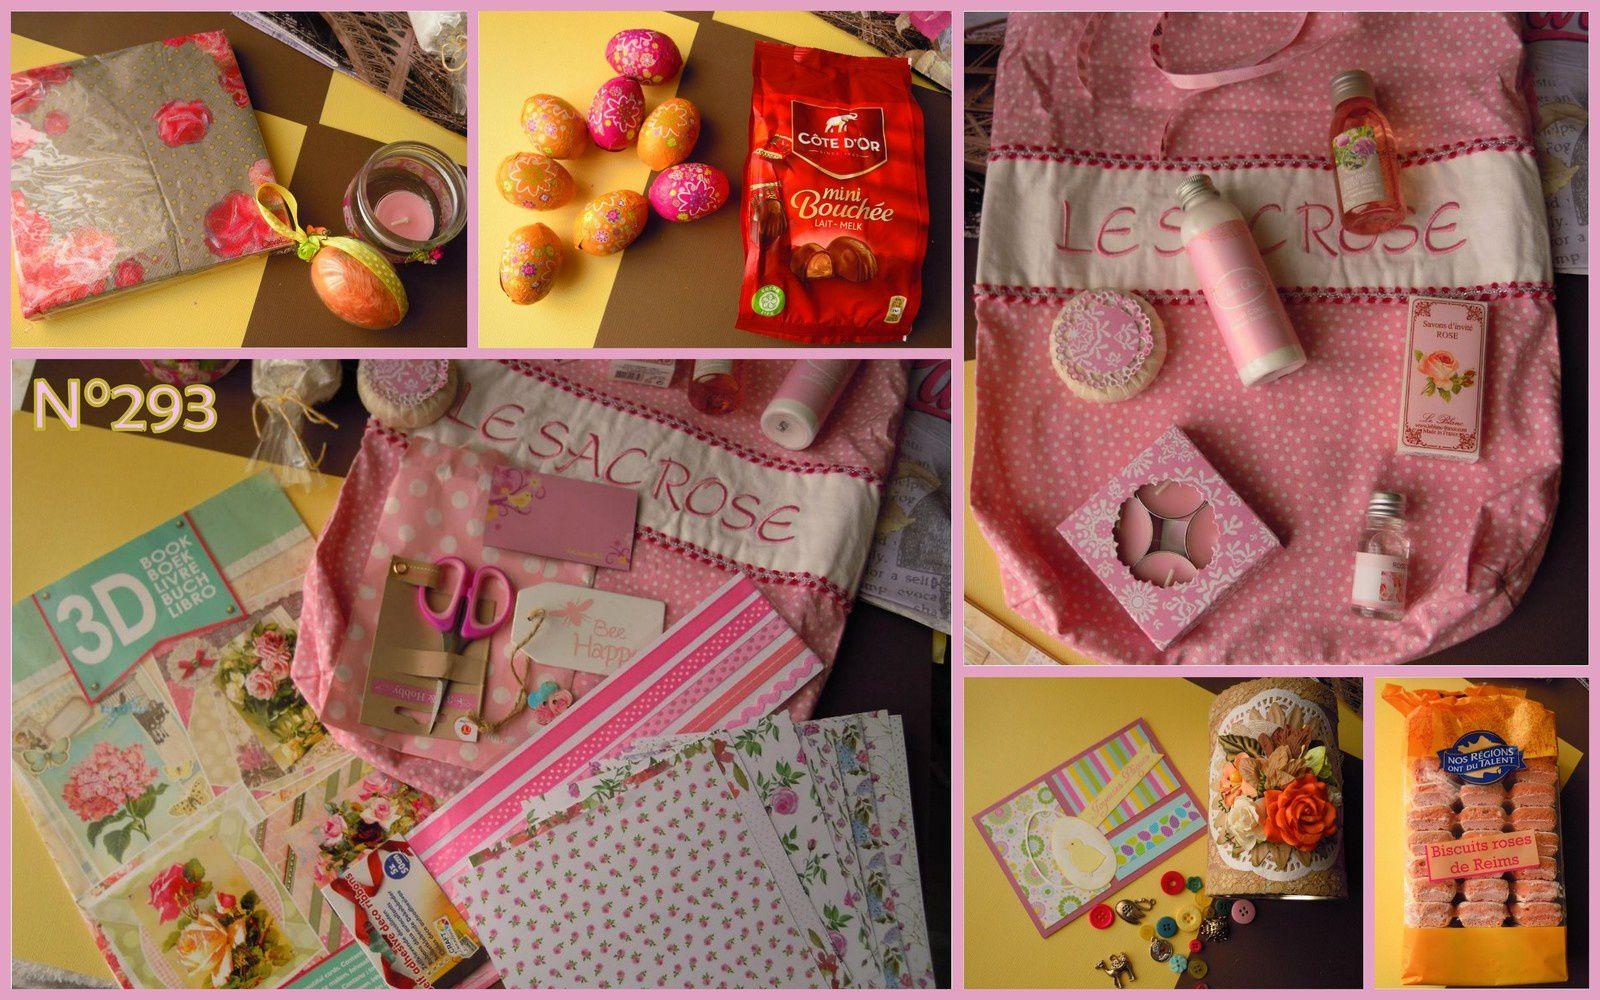 N°293 Le sac rose pour Carinne 87